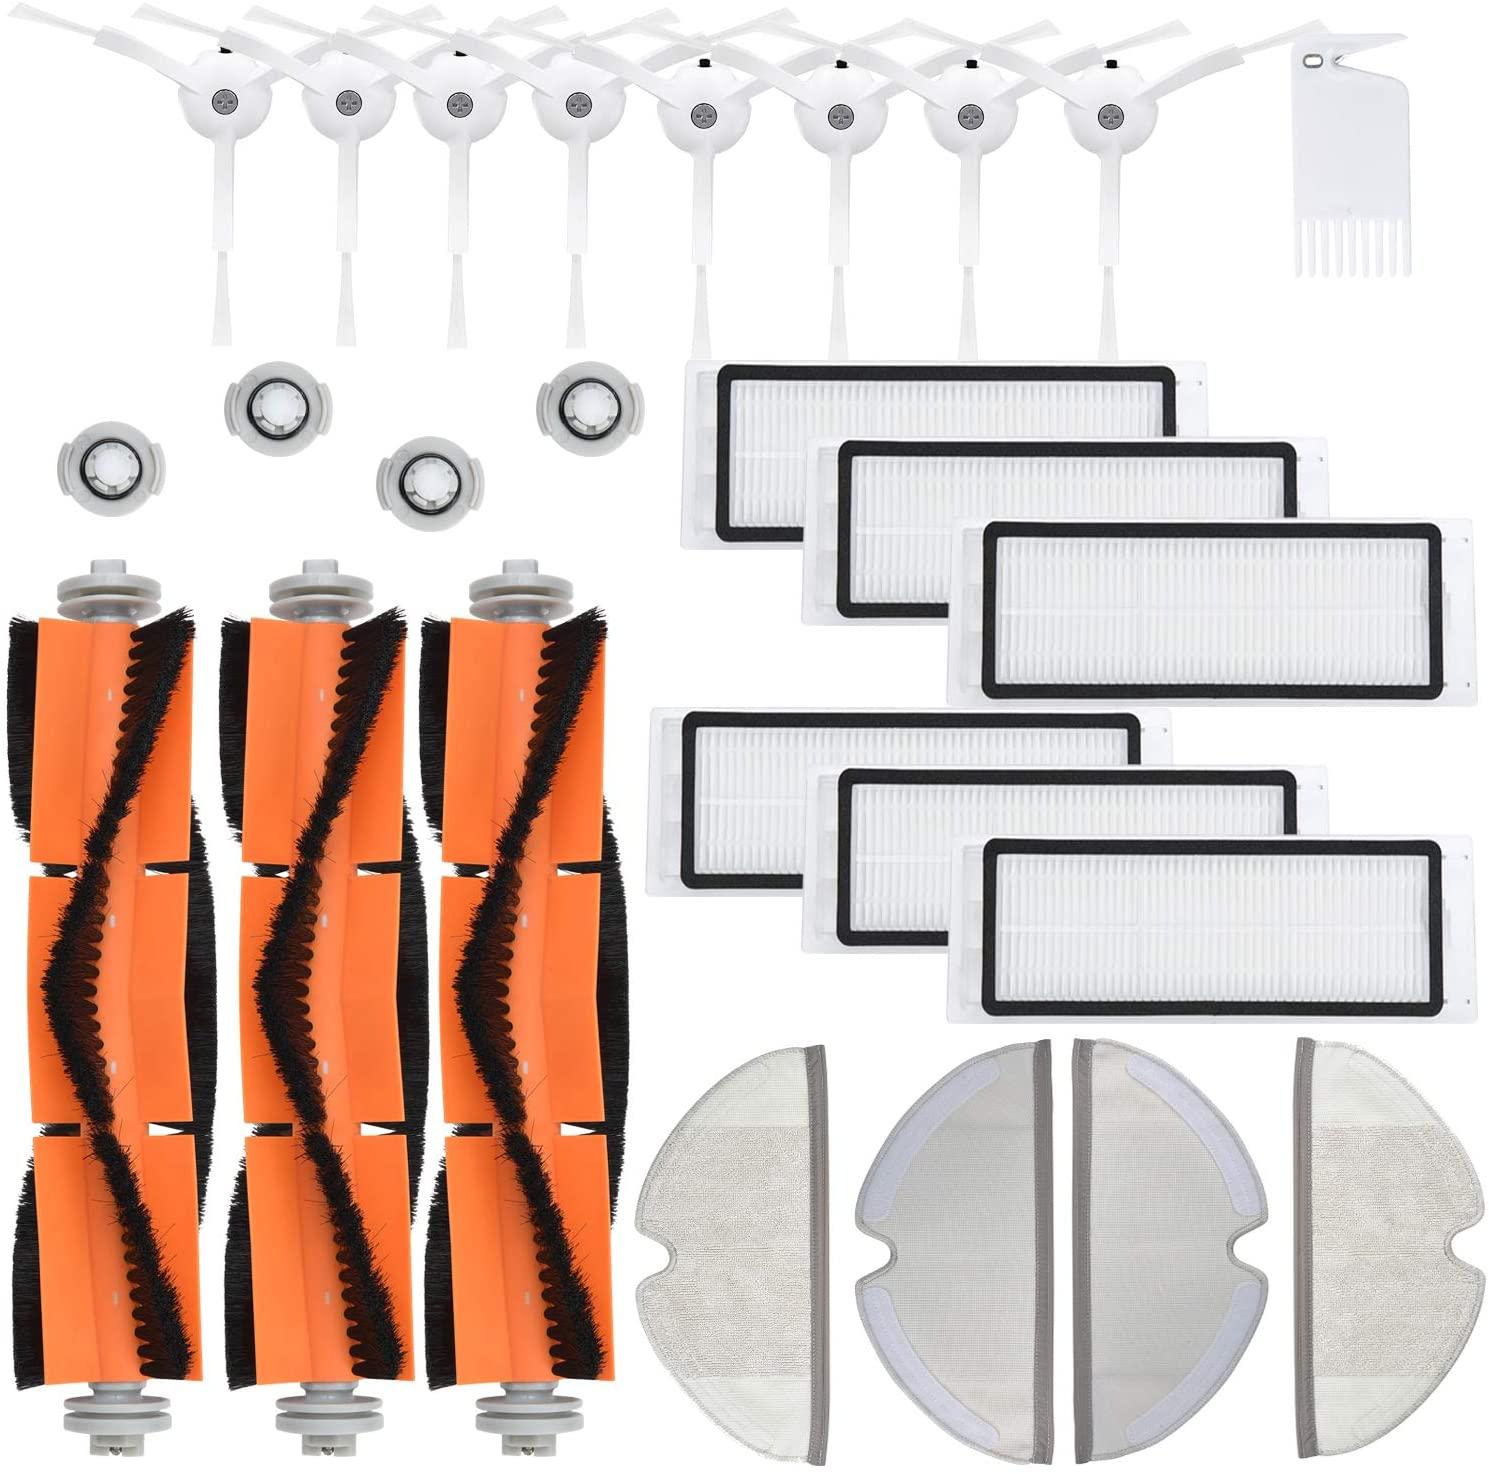 JoyBros 26-Big-Pack Replacement Parts Compatible for Xiaomi Roborock S5 S5 MaxS6 S60 S65 S5 S50 S55 E25 E35 Filter Mop Brush Accessories Vacuum Cleaner Replenishment Kit